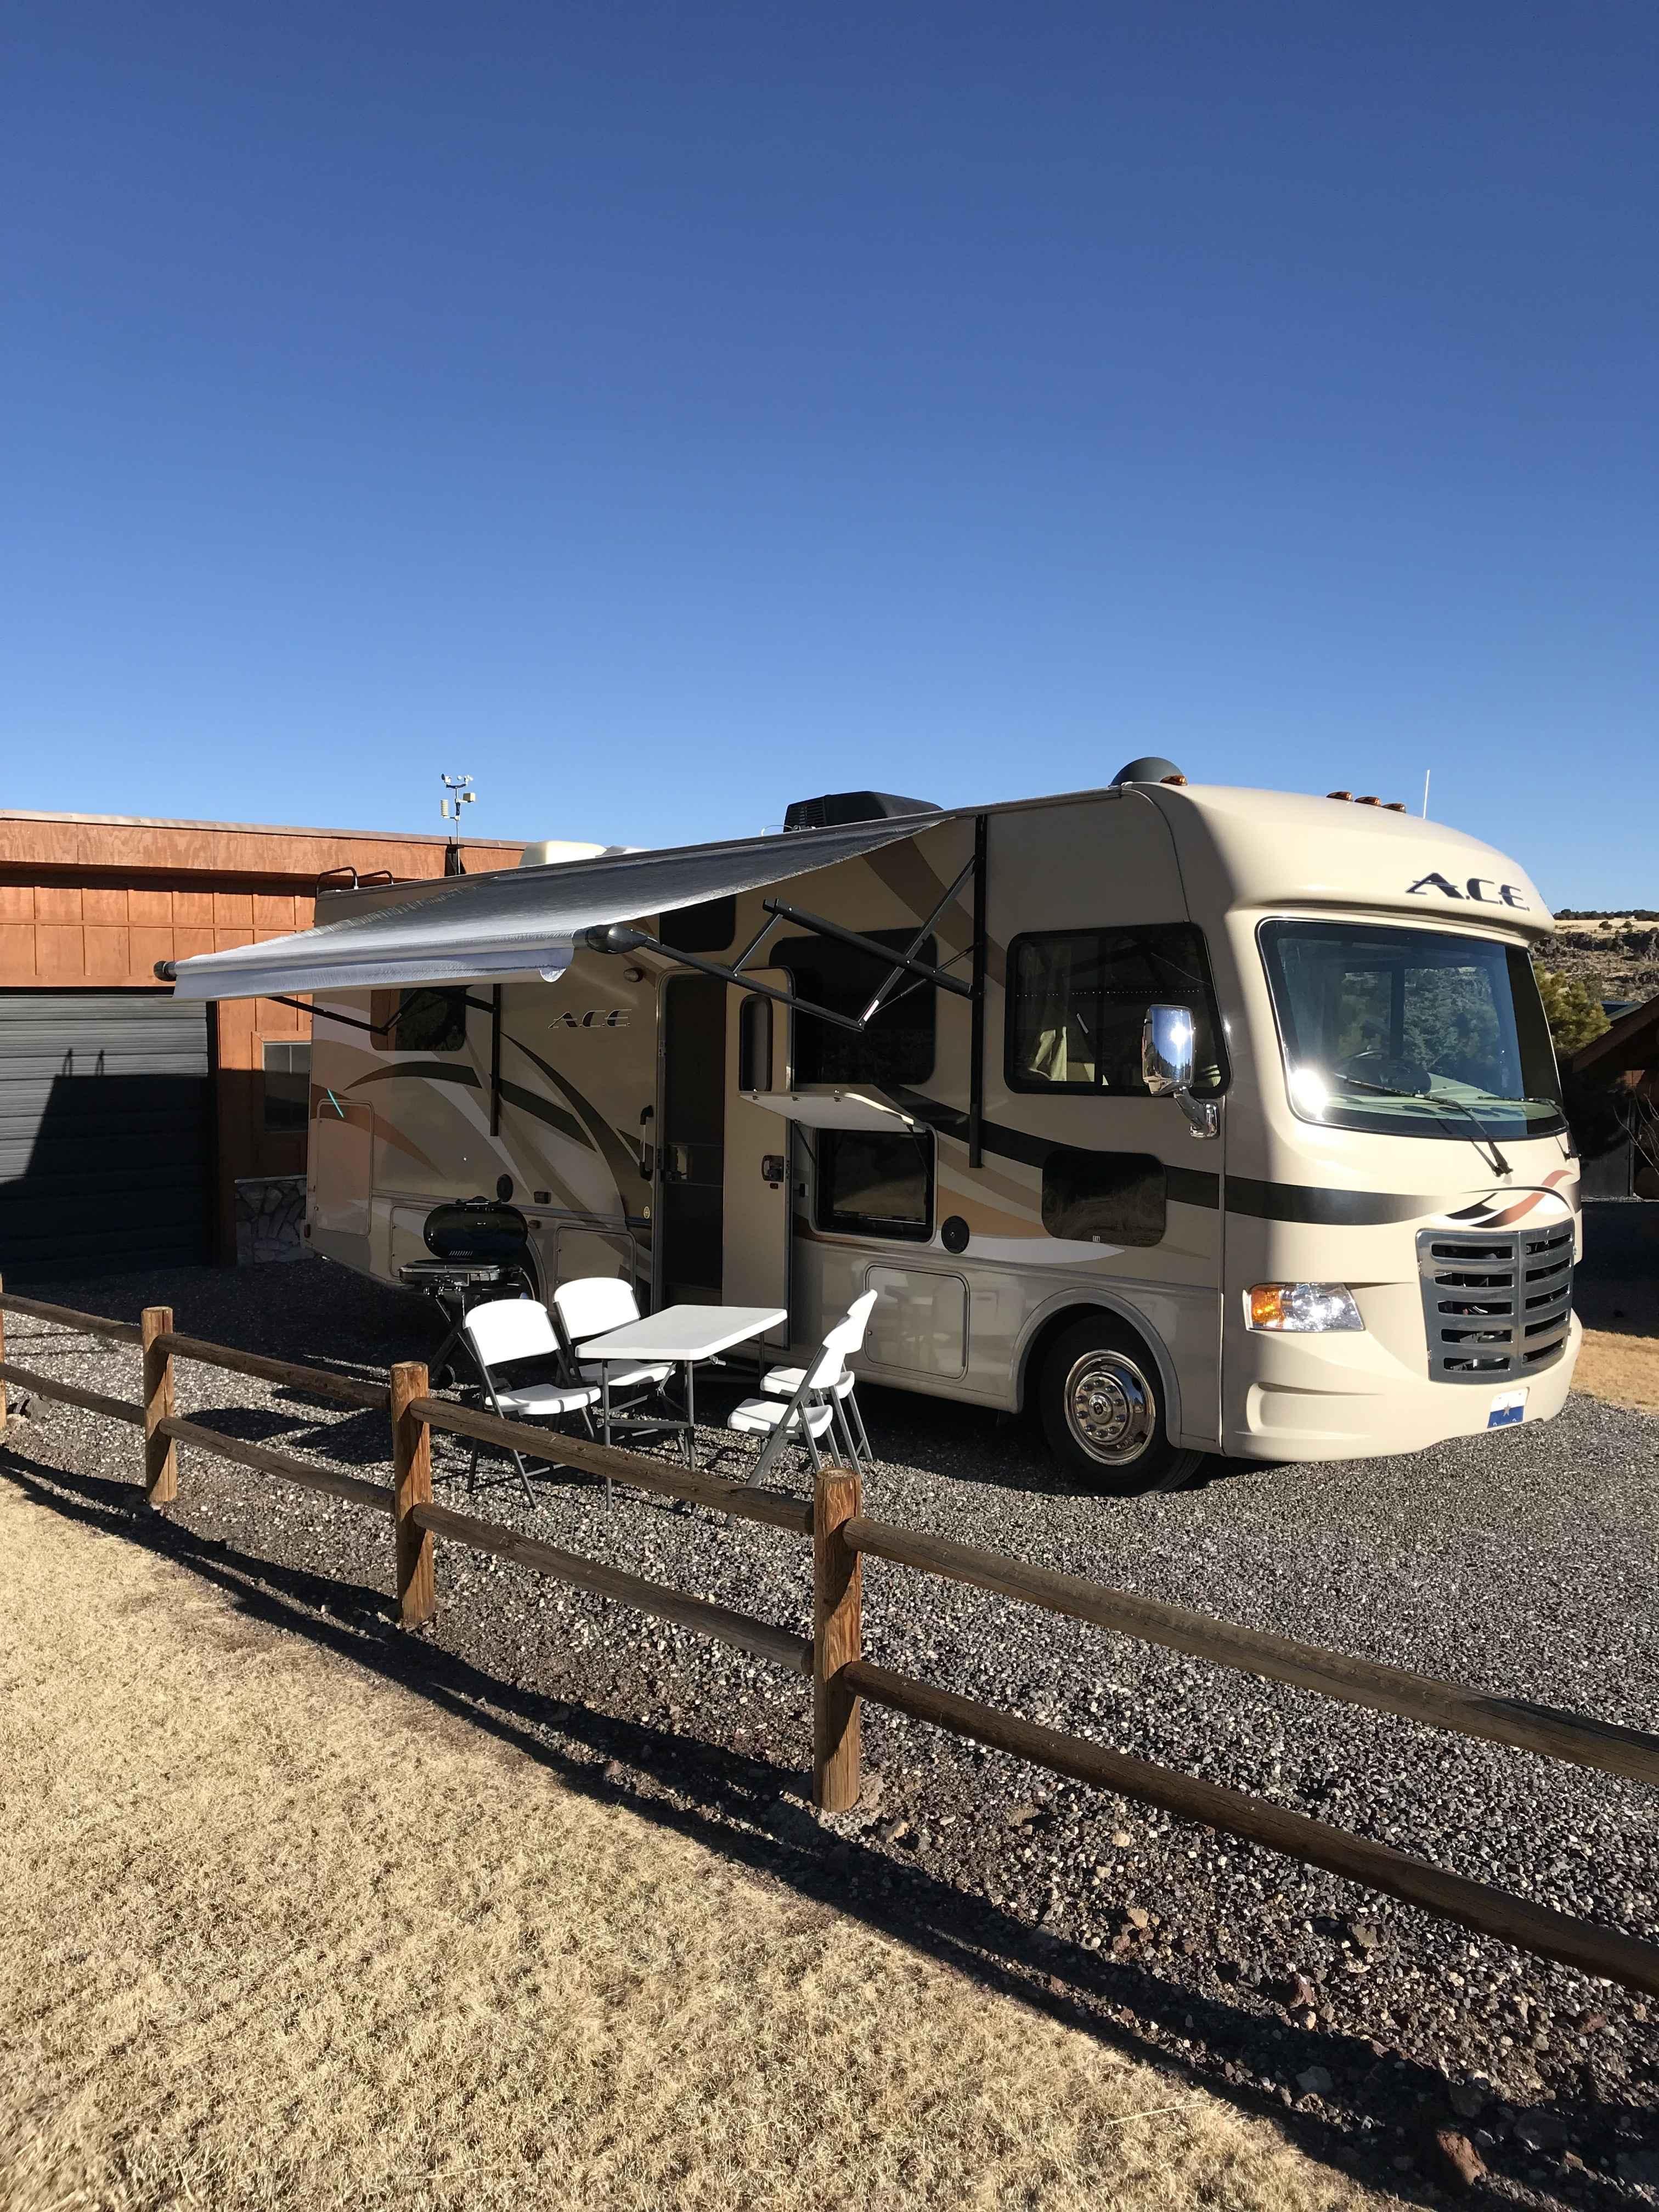 2015 used thor motor coach a c e 29 2 class a in arizona az for Class a motor coach